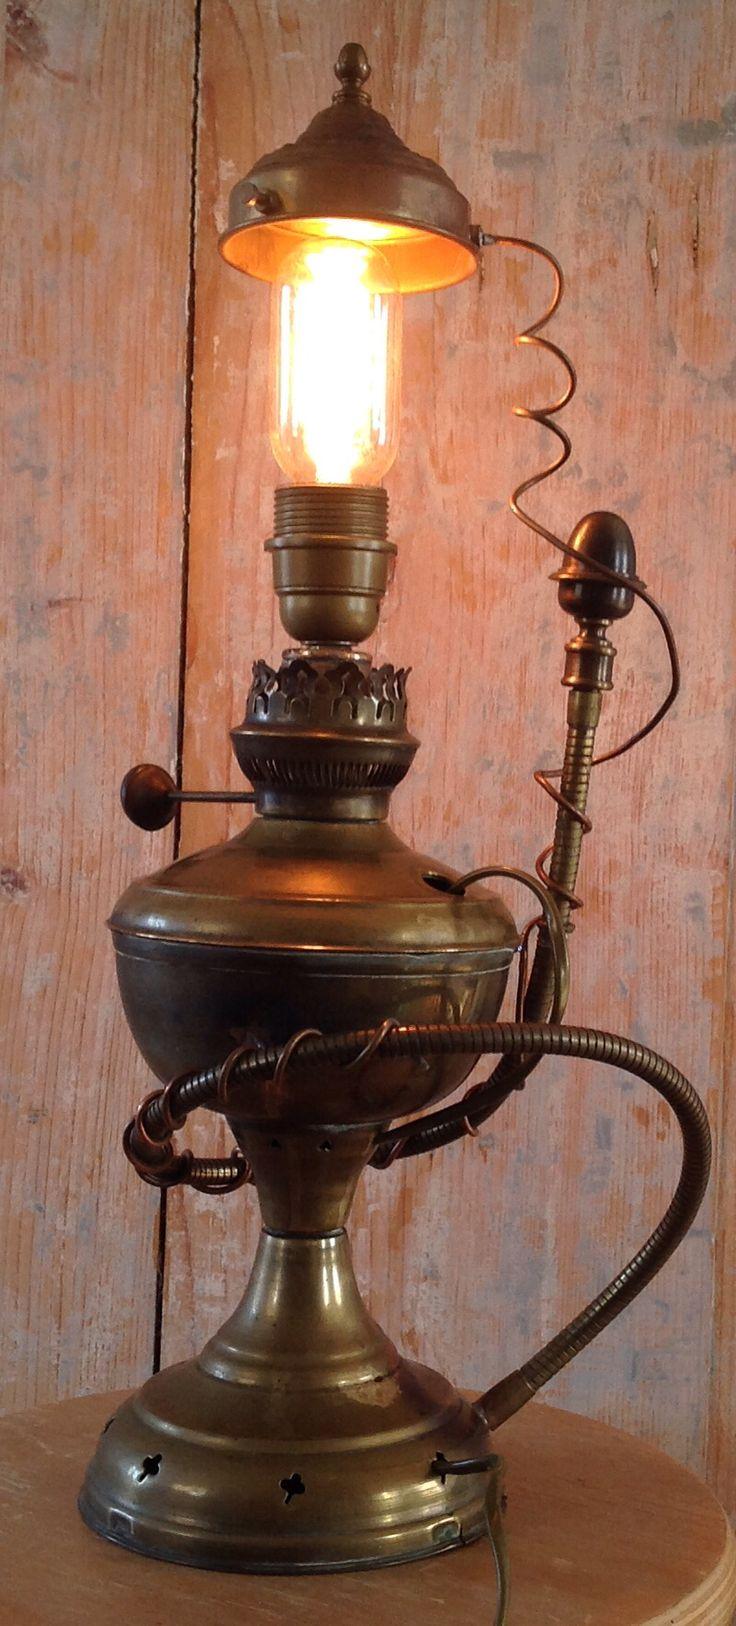 Steampunk olielamp - 95,-